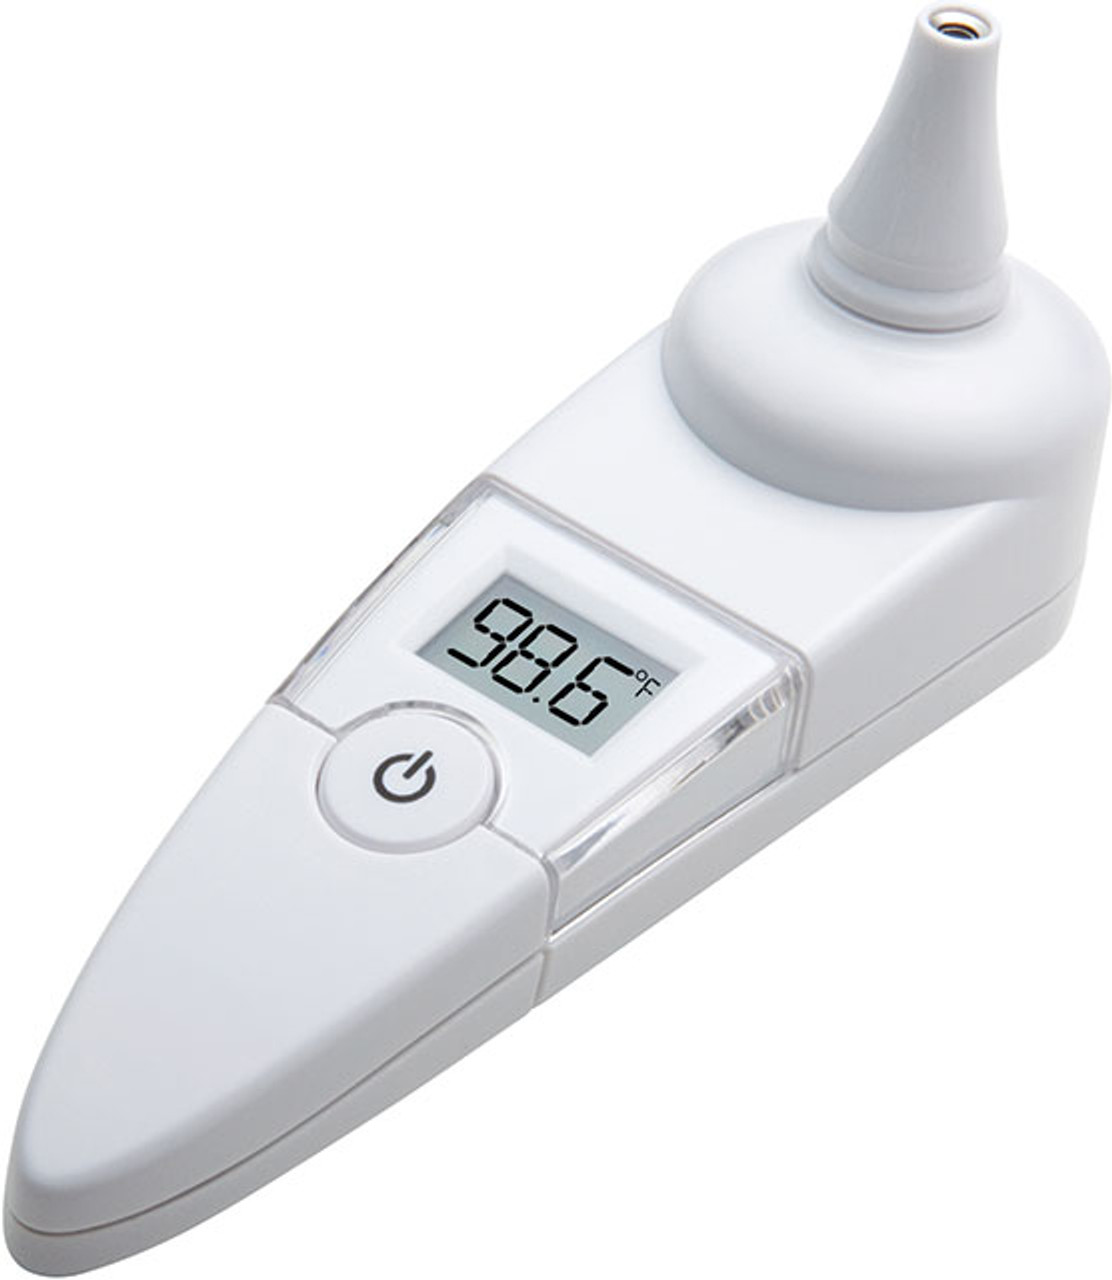 421 Adtemp Tympanic Thermometer